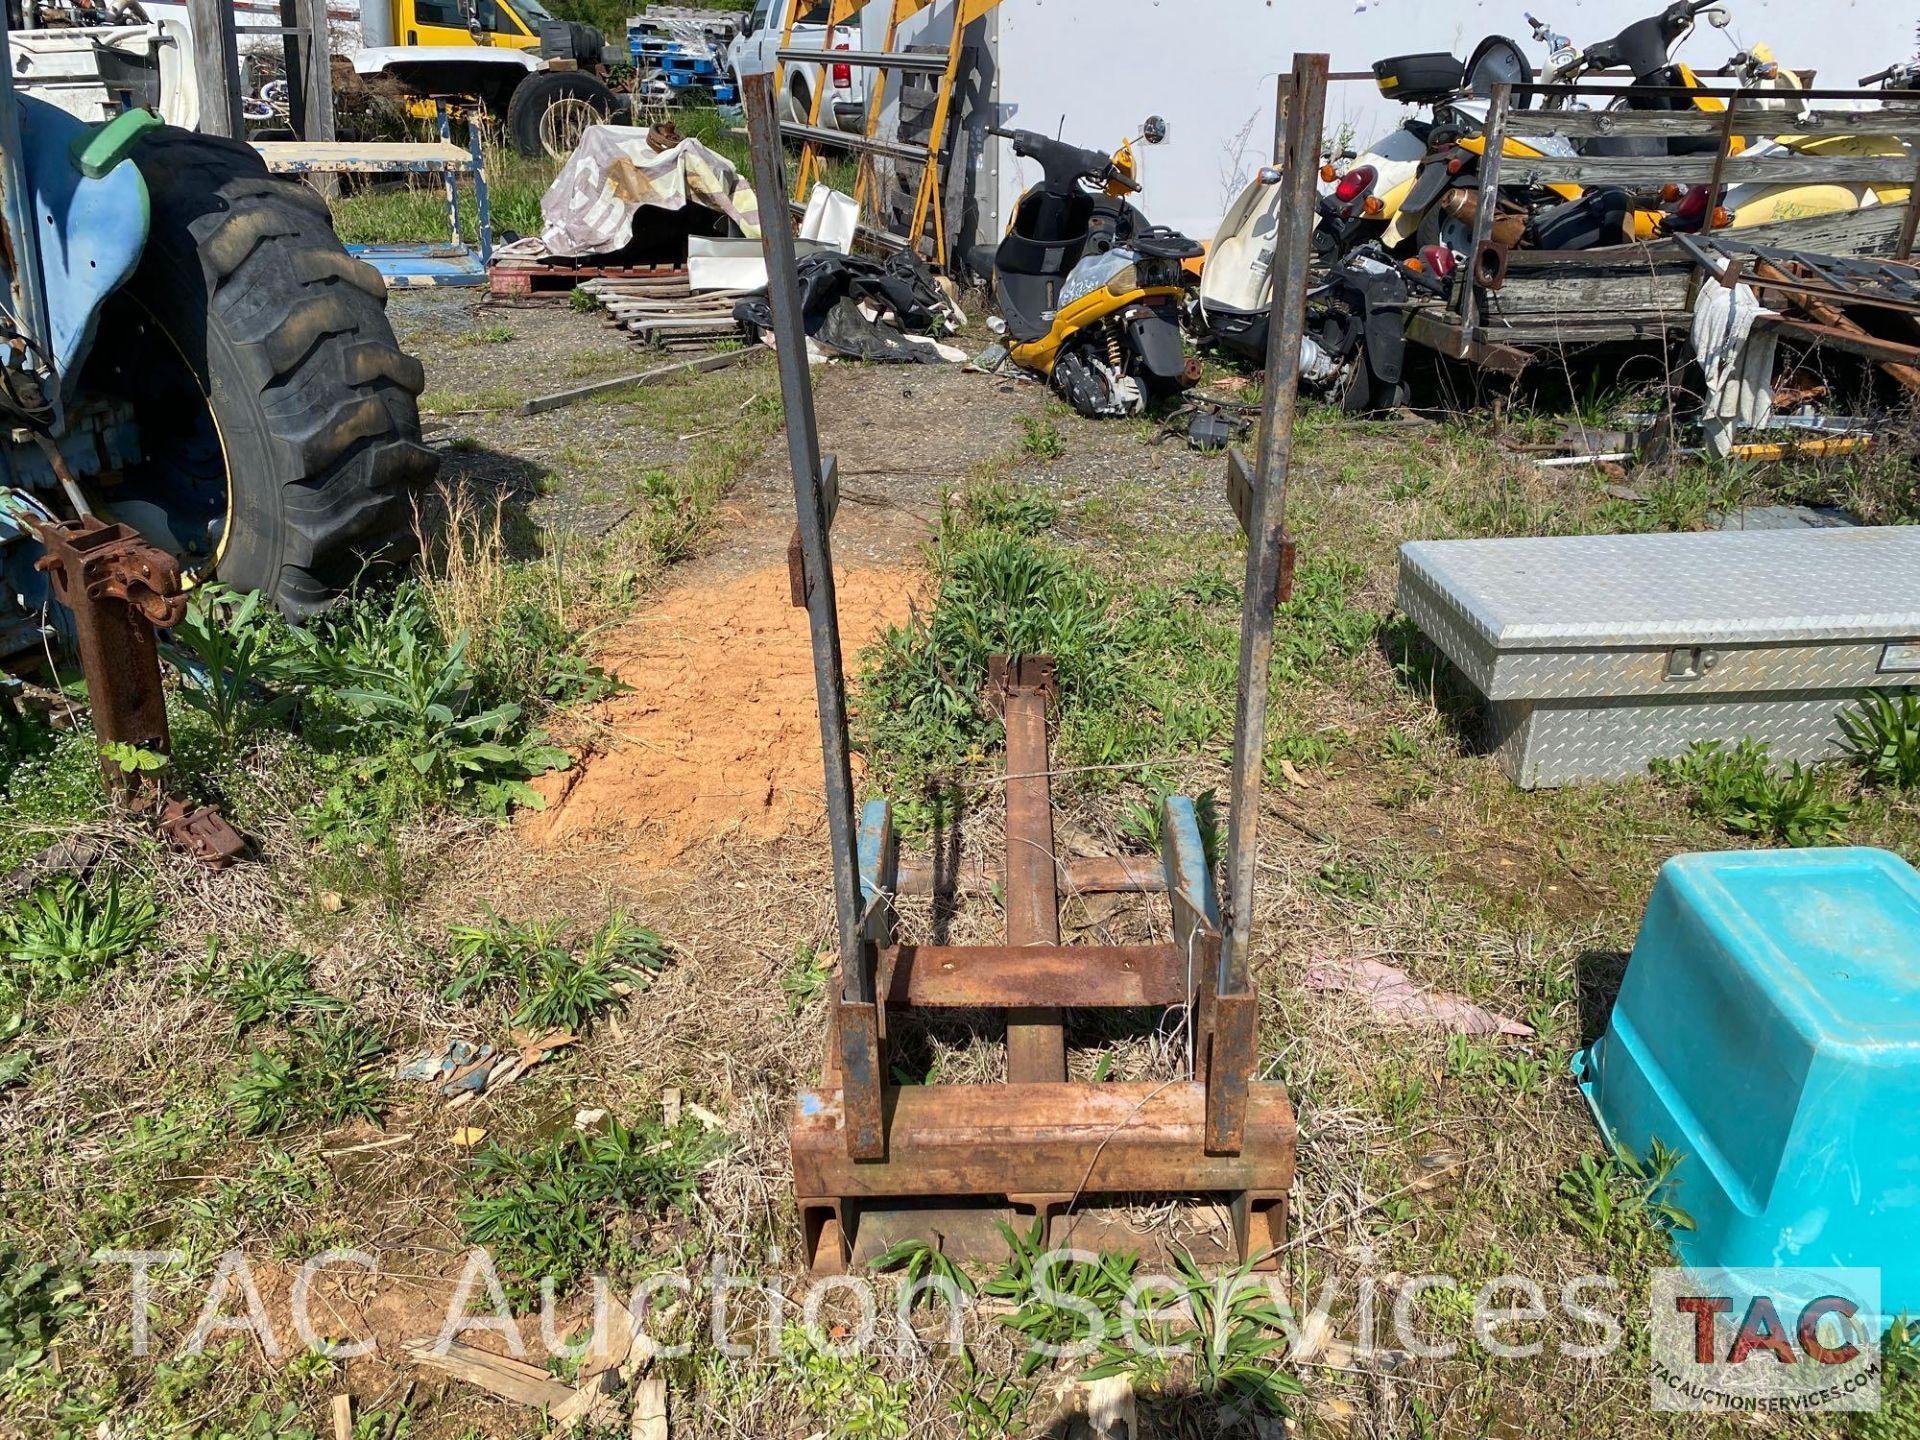 John Deere 2150 Farm Tractor - Image 24 of 34